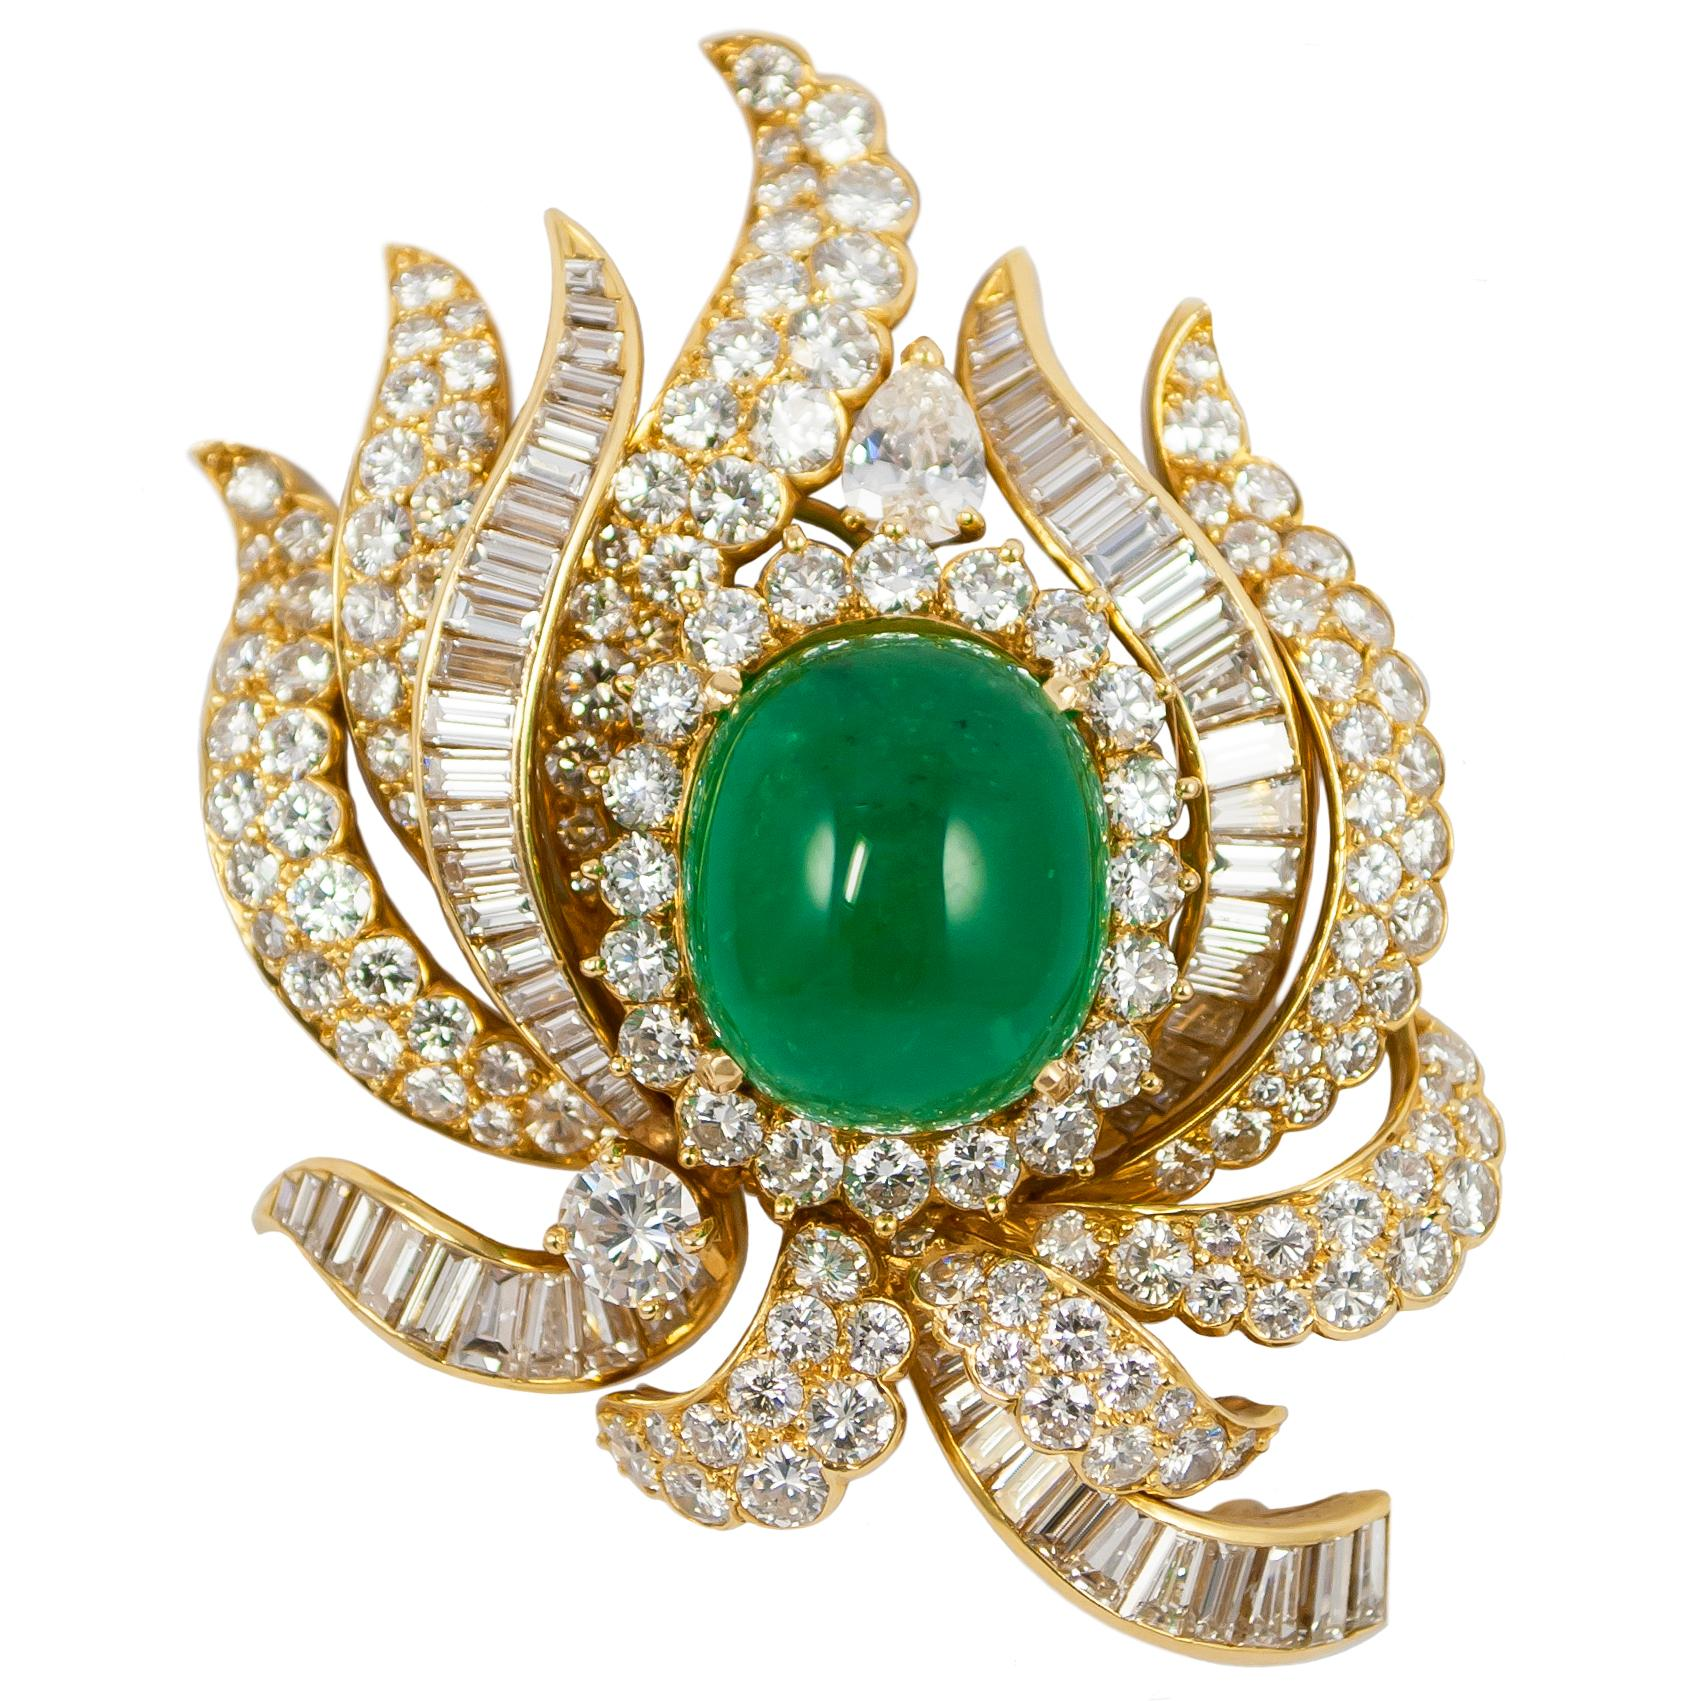 Cartier Emerald and Diamond Brooch